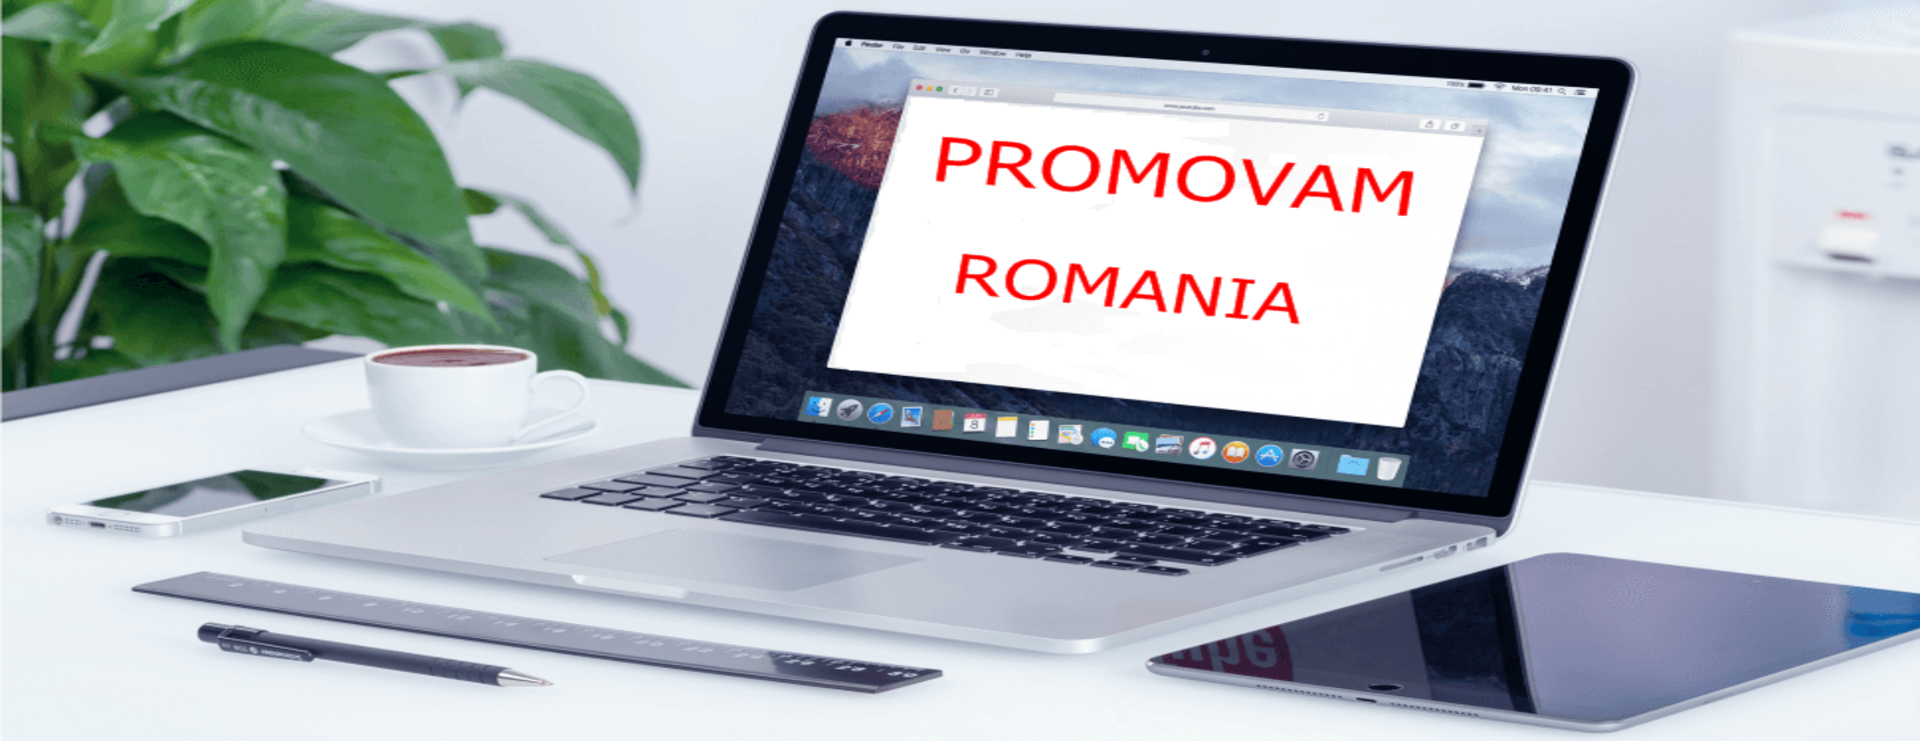 promovam romania